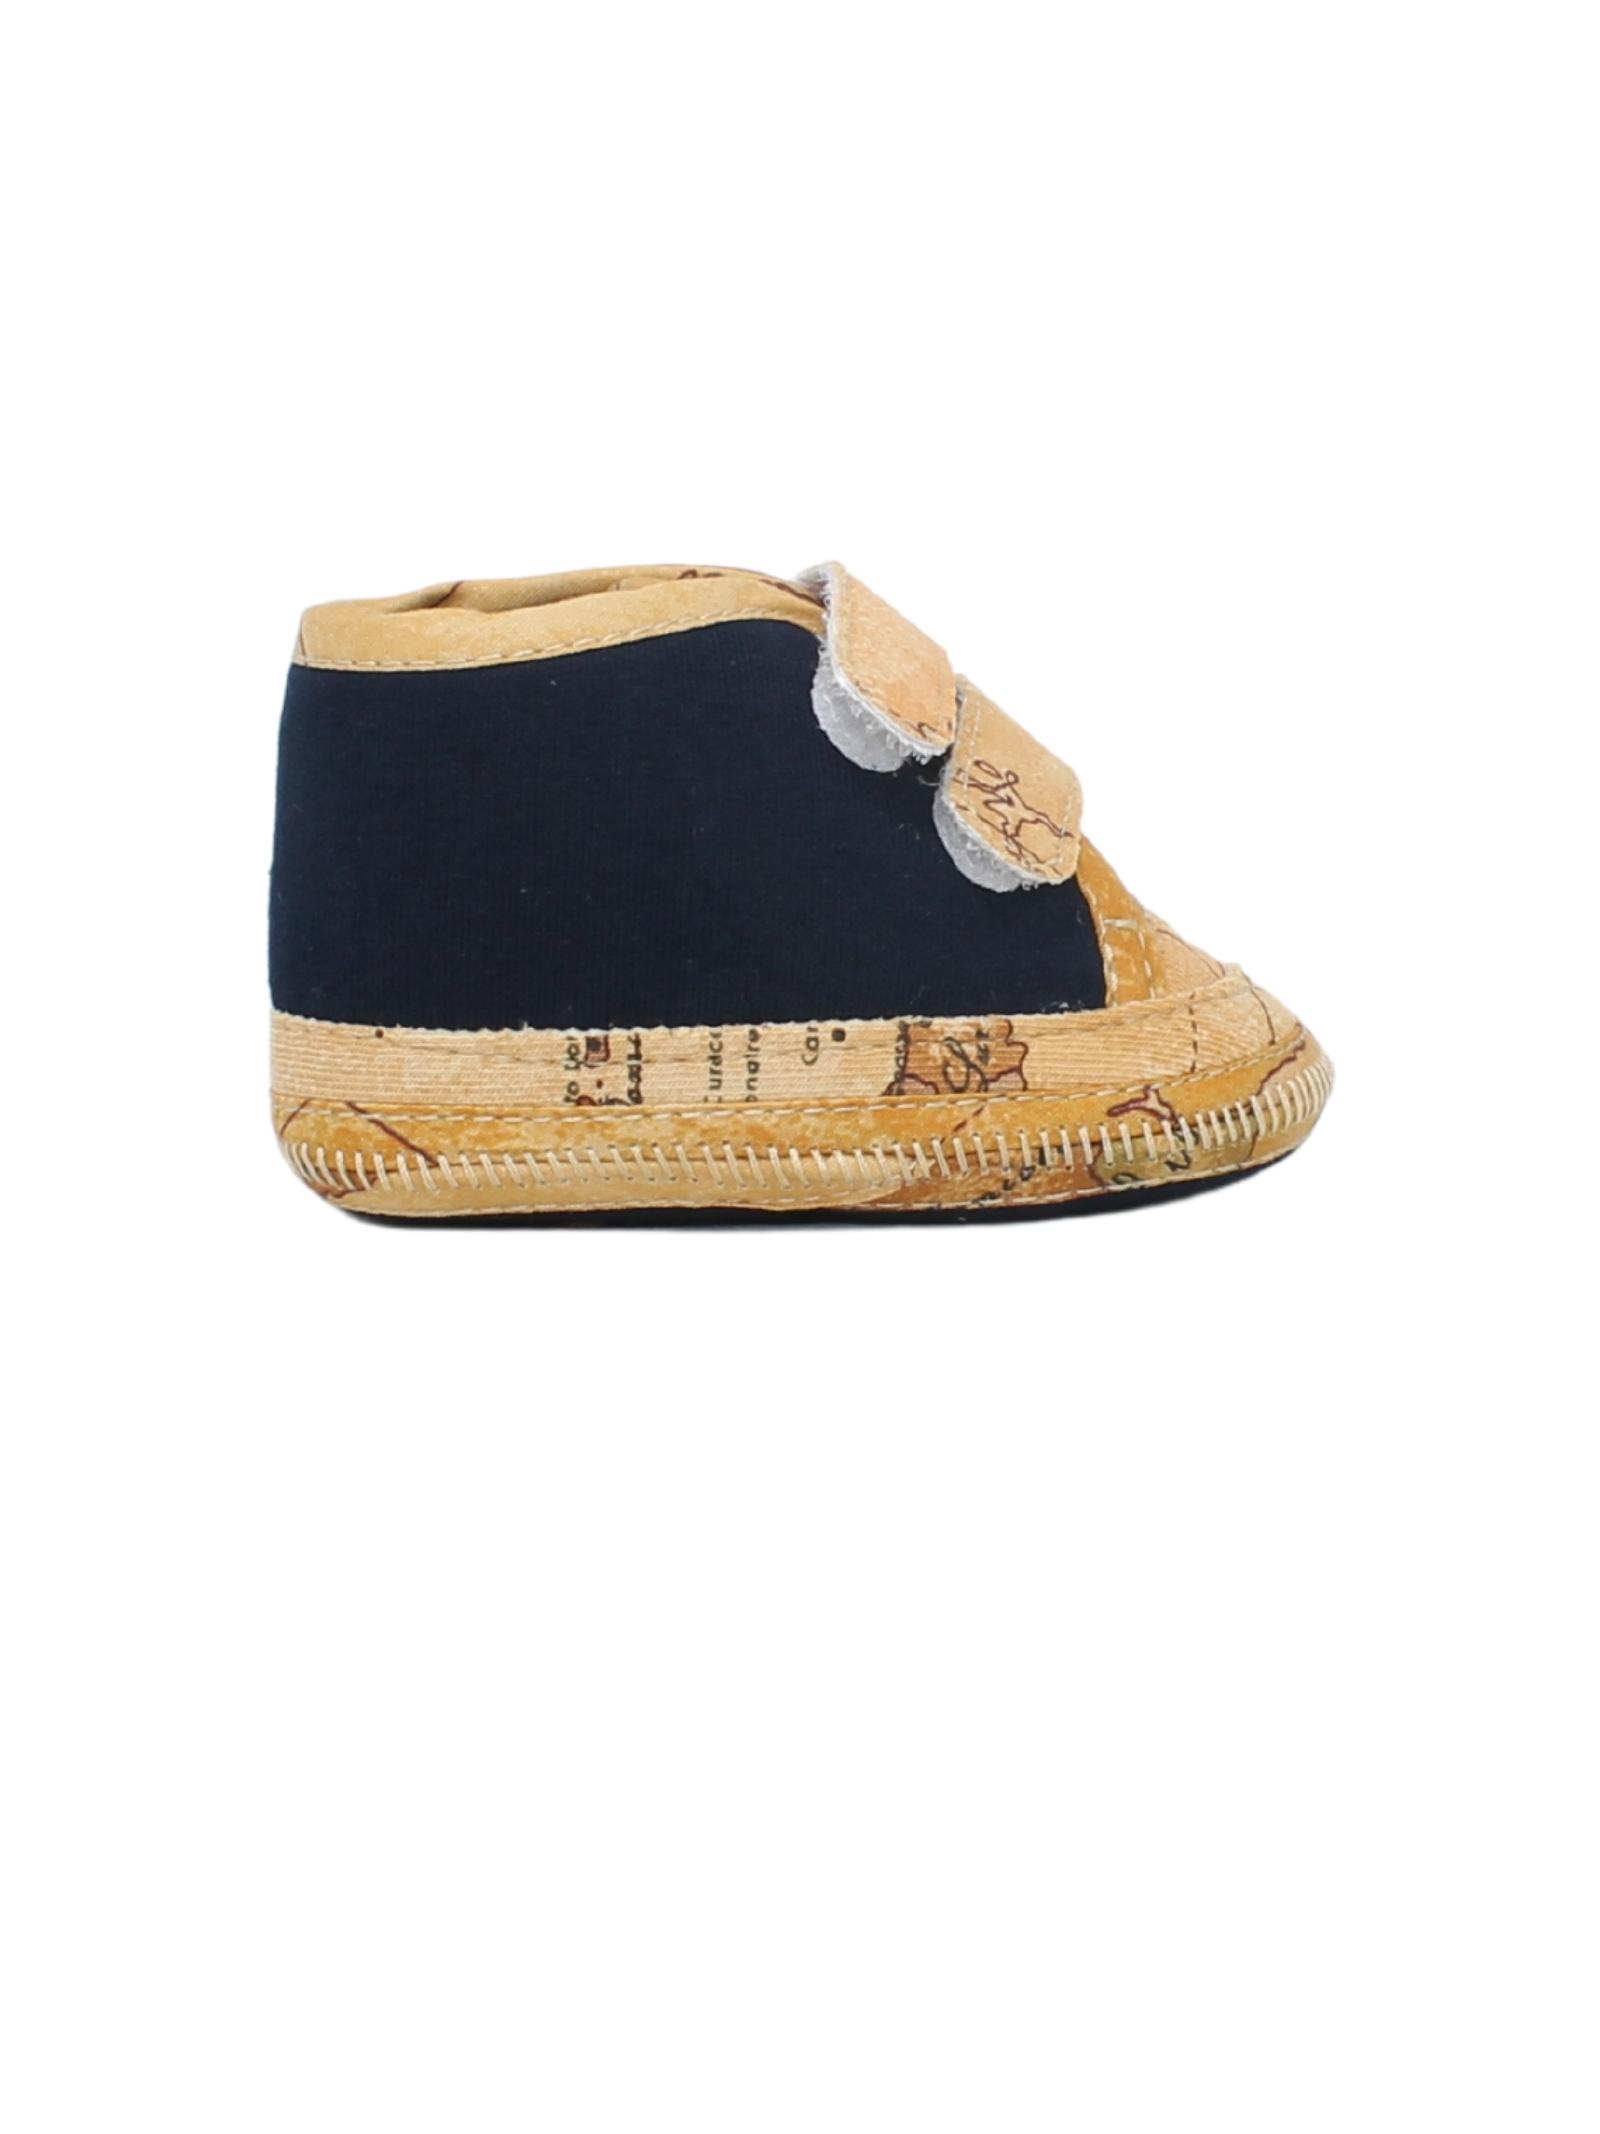 Baby Logo Shoes ALVIERO MARTINI 1° CLASSE JUNIOR | Shoes | 257SH0563BLU